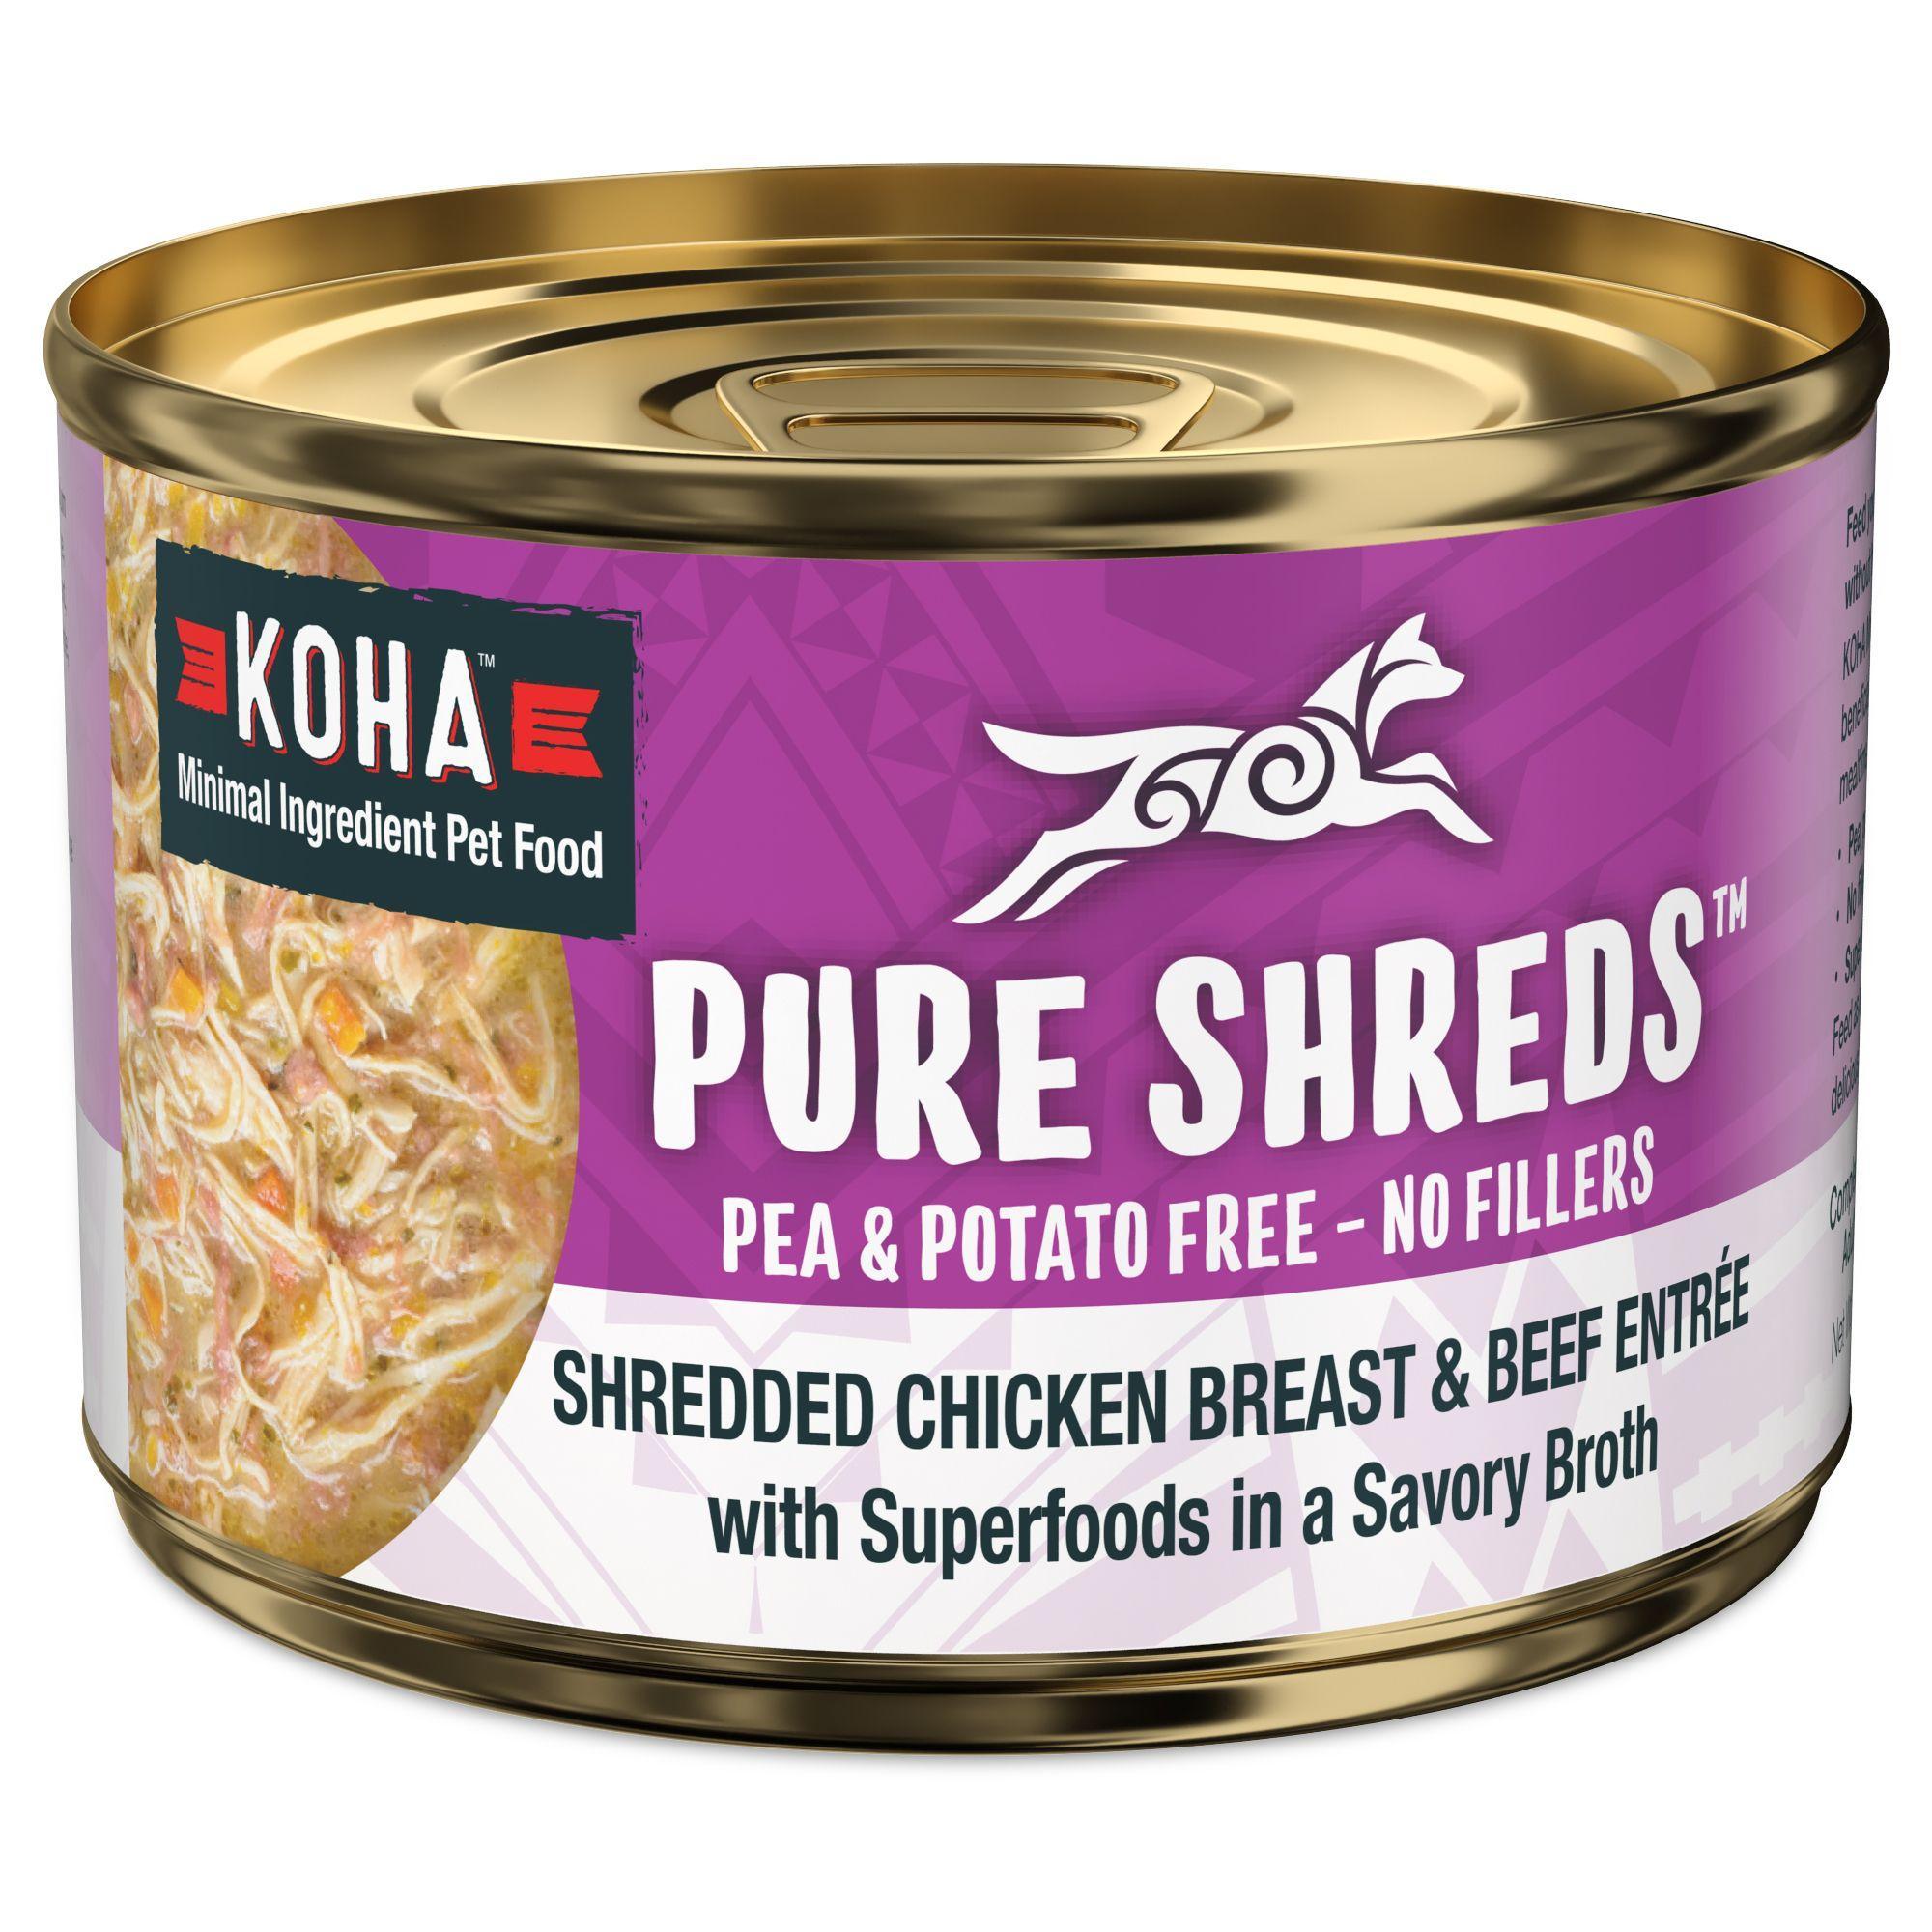 Koha Pure Shreds Shredded Chicken Breast & Beef Entree Canned Dog Food, 5.5-oz